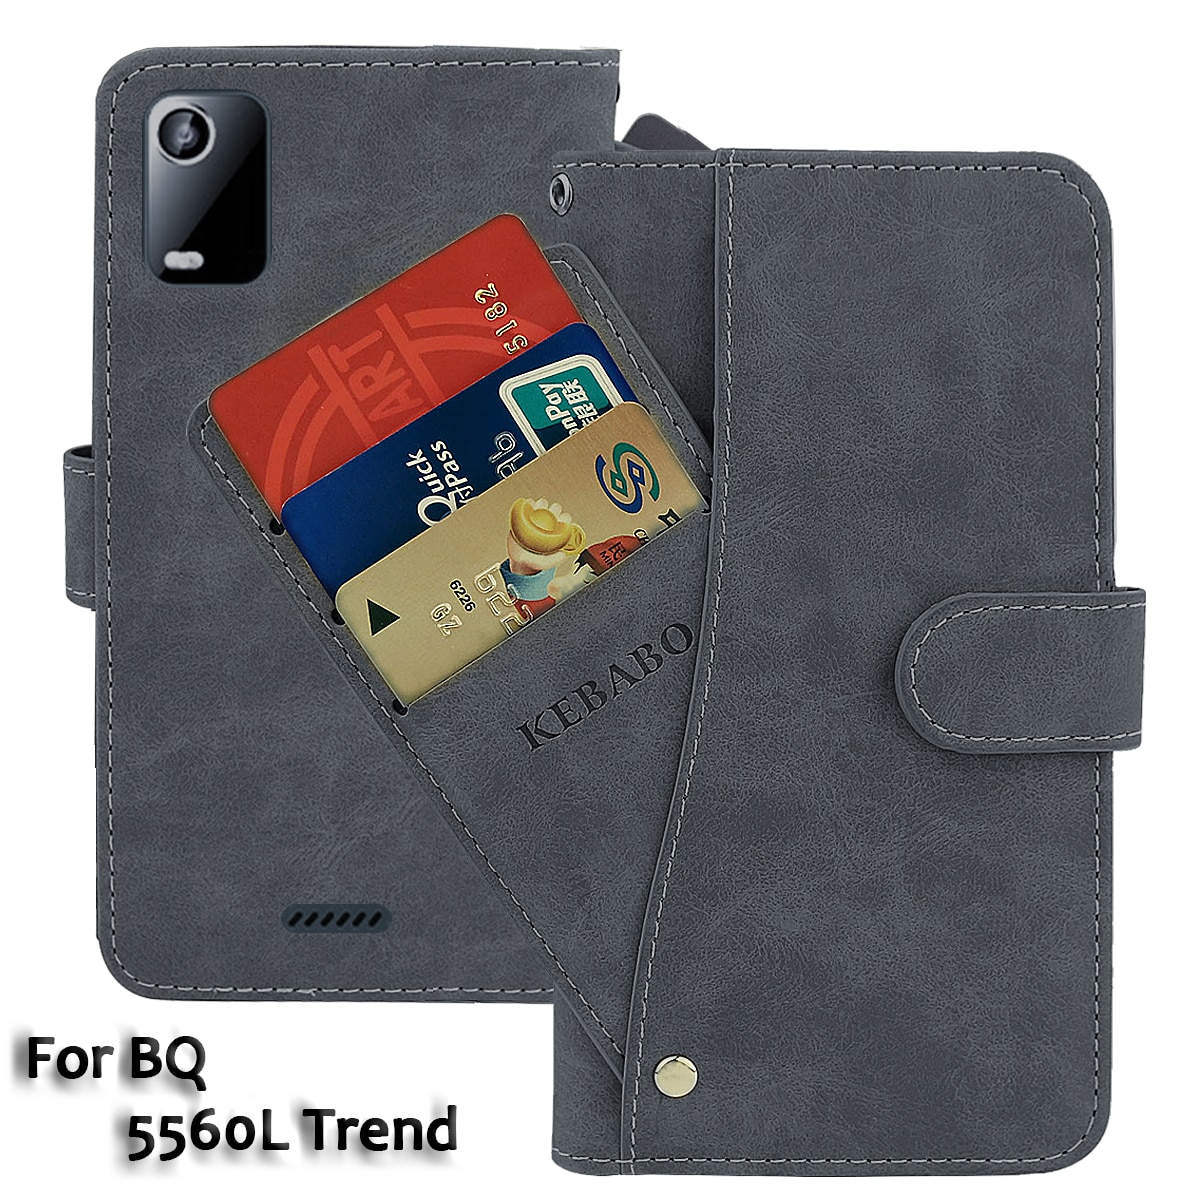 Leather Wallet BQ 5560L Trend Case 5.45